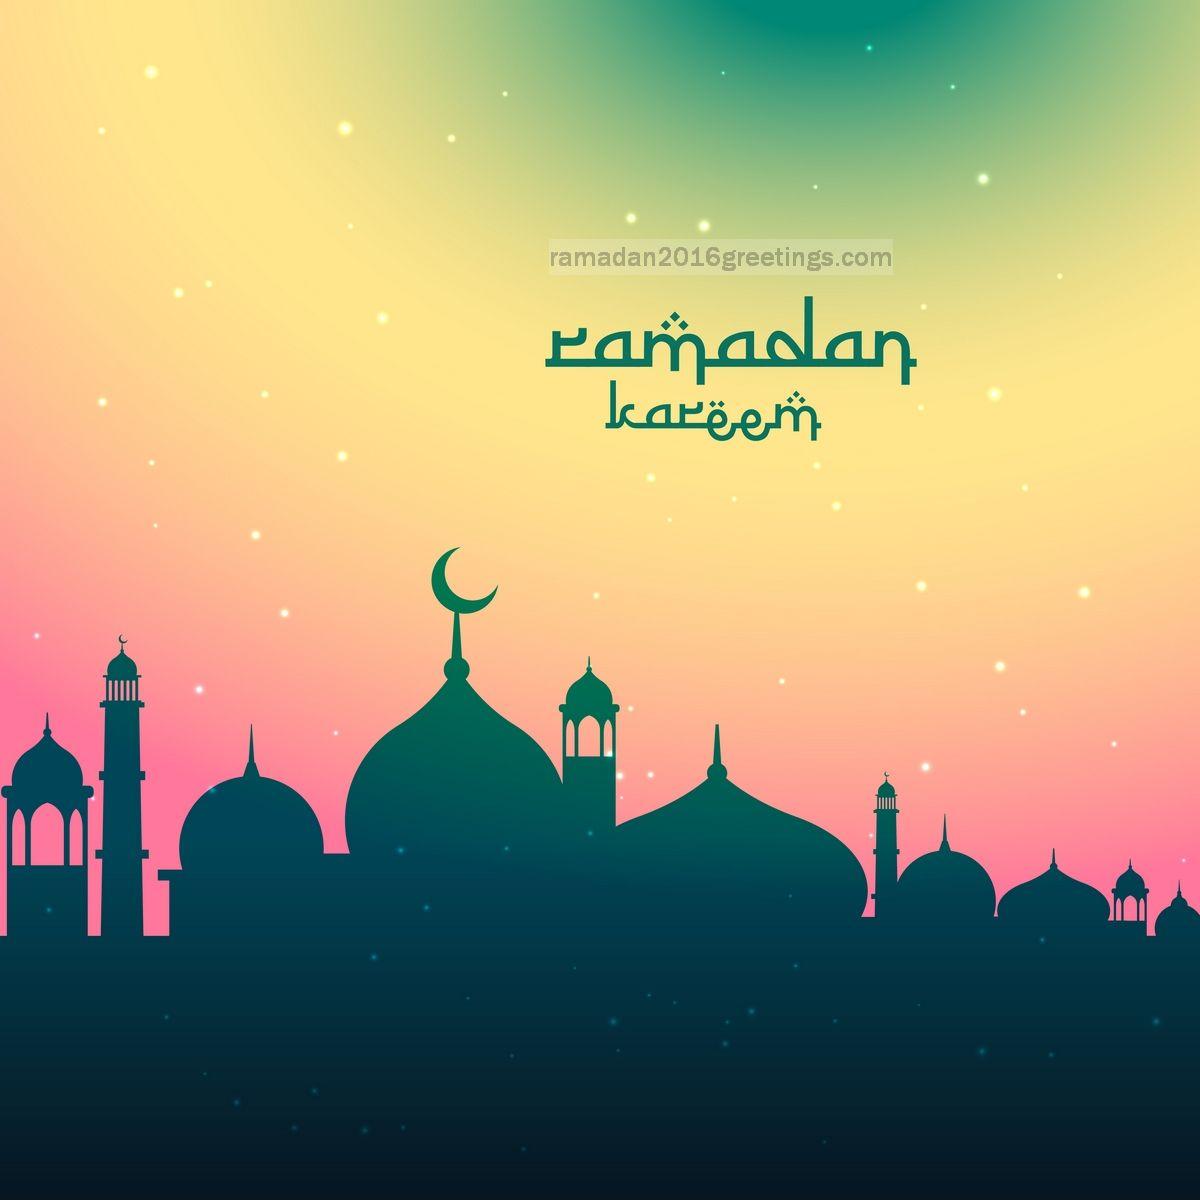 Ramadan 2016 ramadan greetings eid al fitr 2016 quotes ramadan read purpose of ramadan 2016 kristyandbryce Choice Image